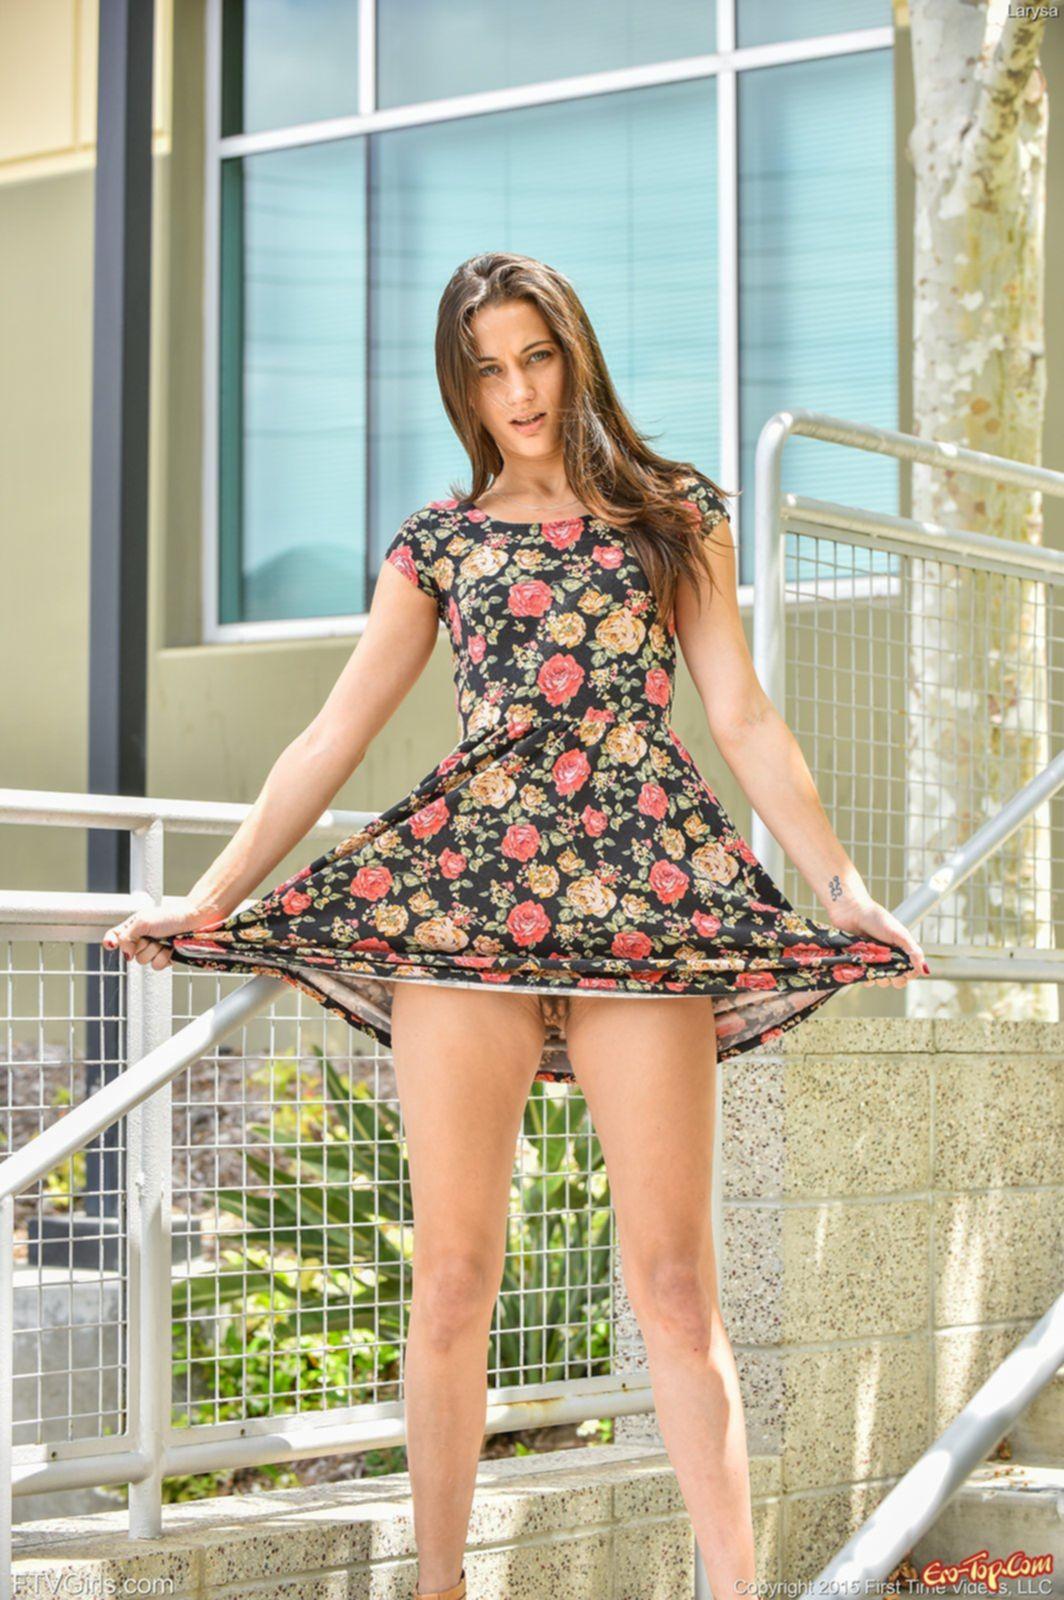 Киска у девушки под платьем - фото эротика.